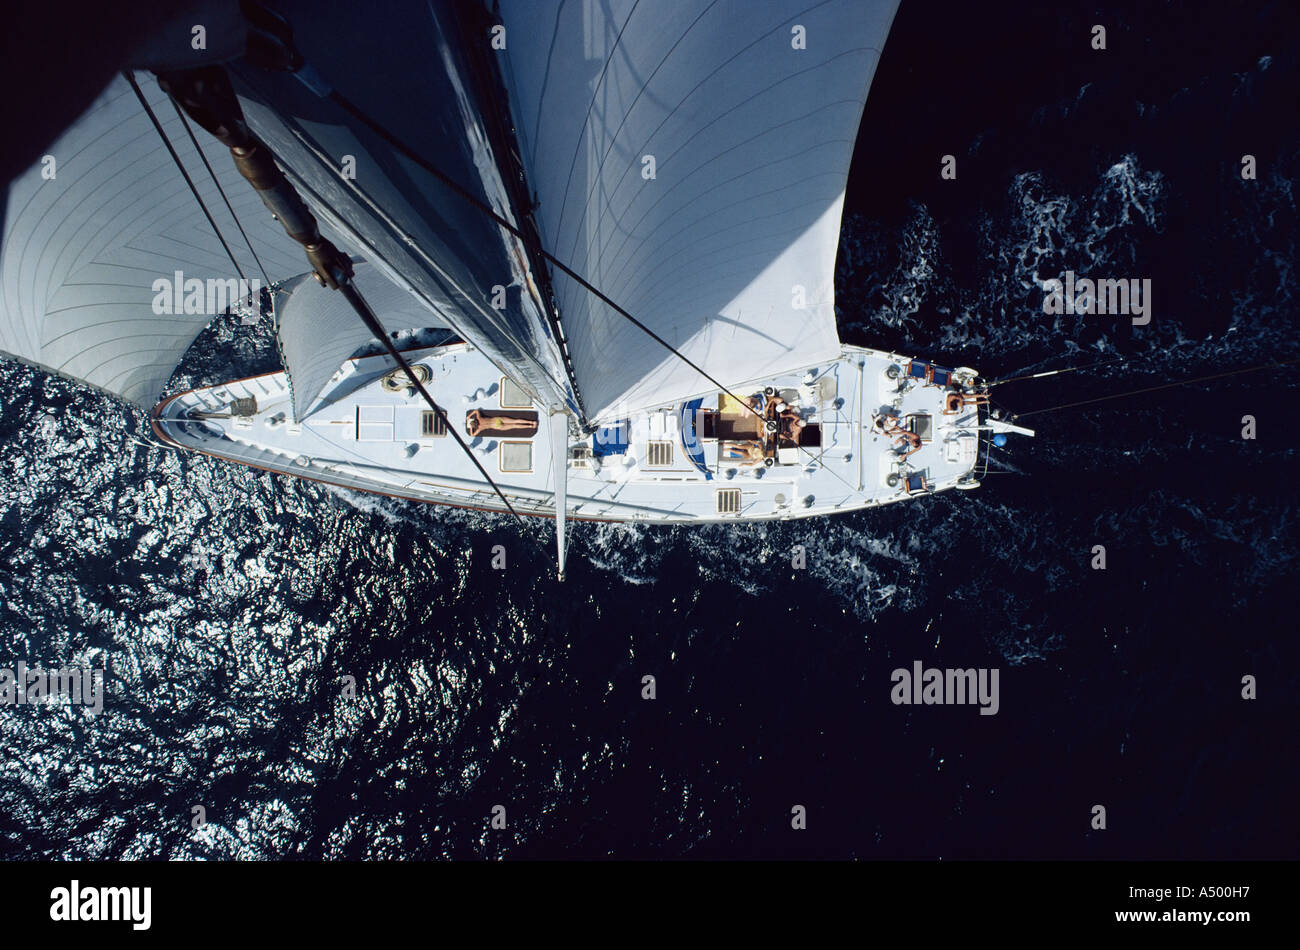 Sunbather on sailboat - Stock Image